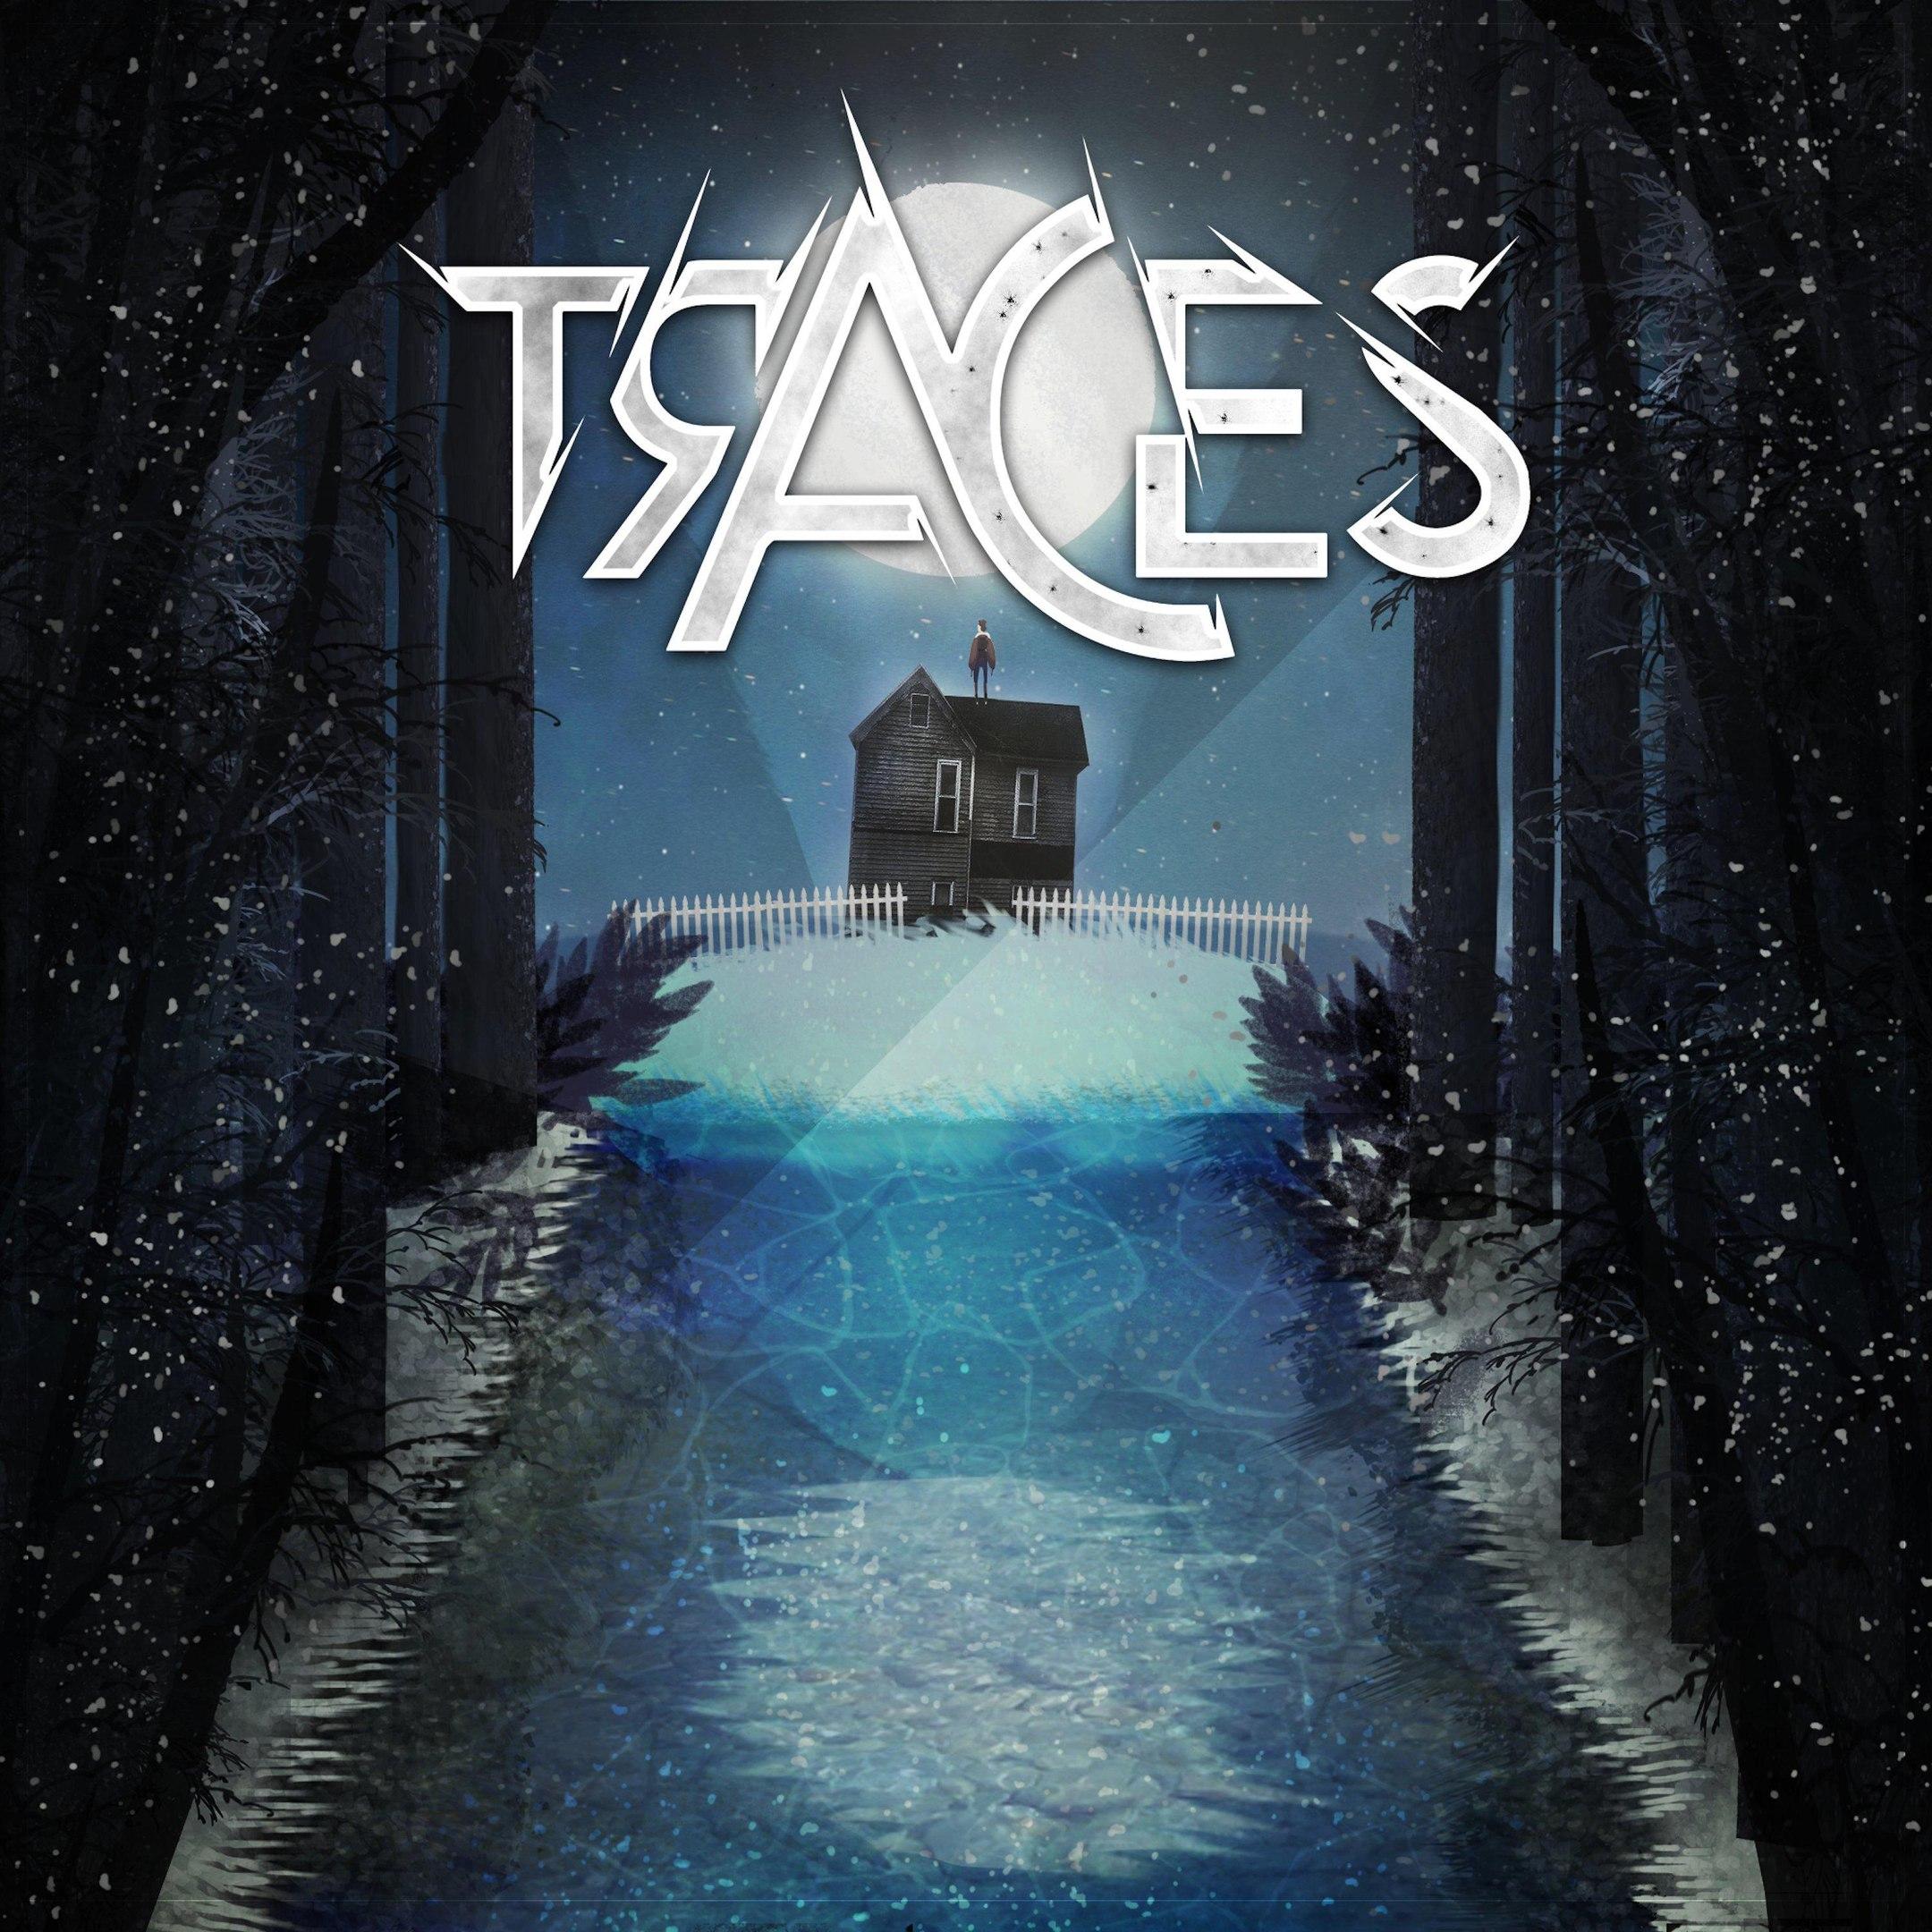 Traces - Traces [EP] (2016)